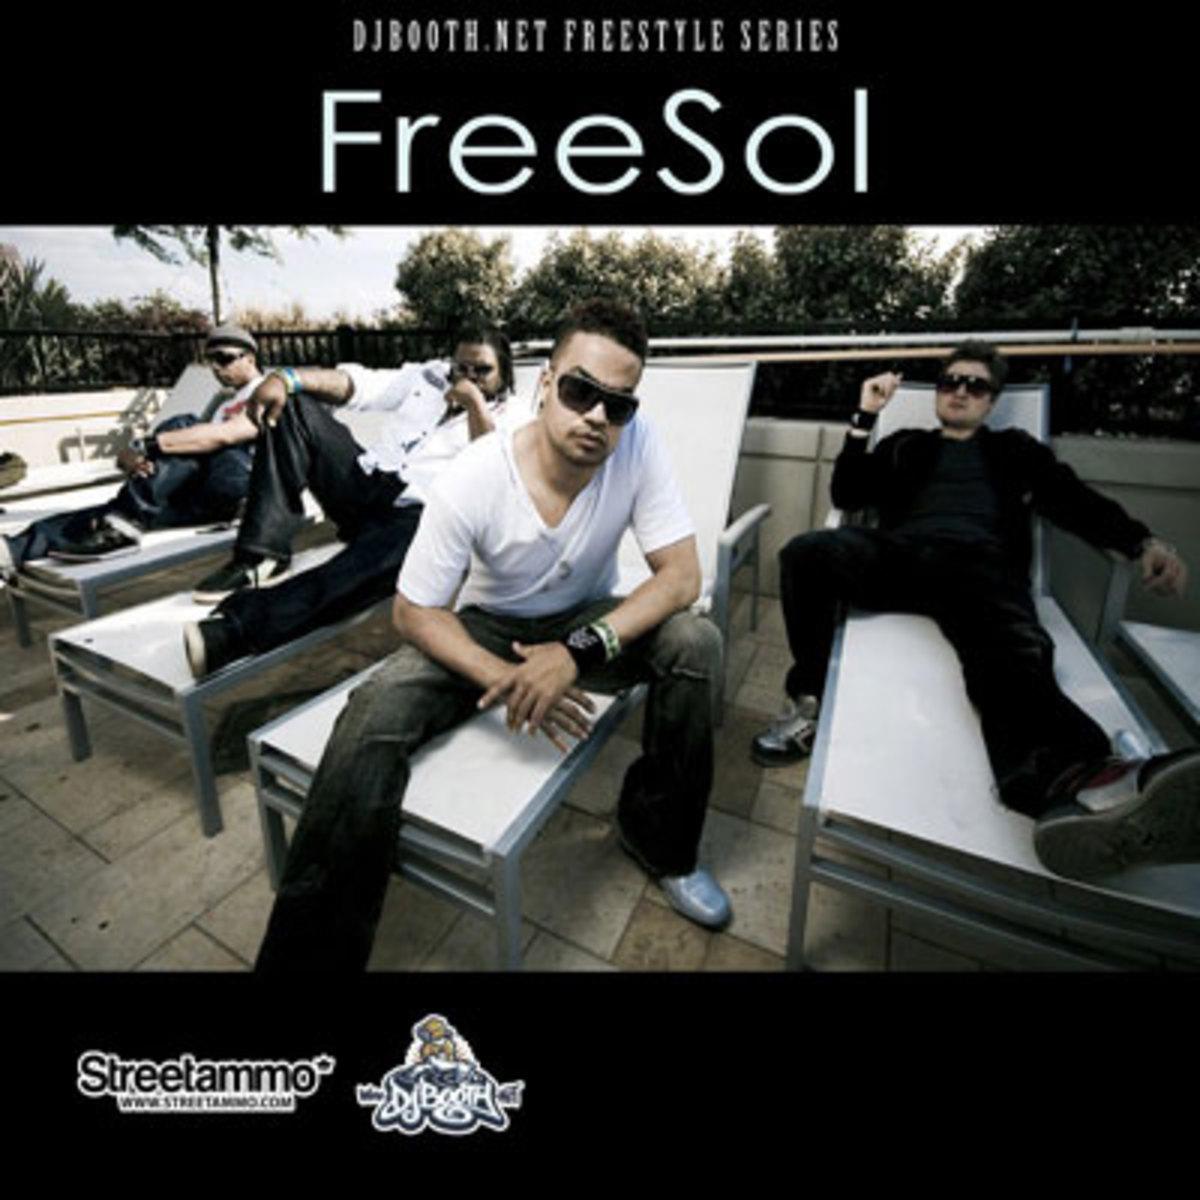 freesol-free.jpg